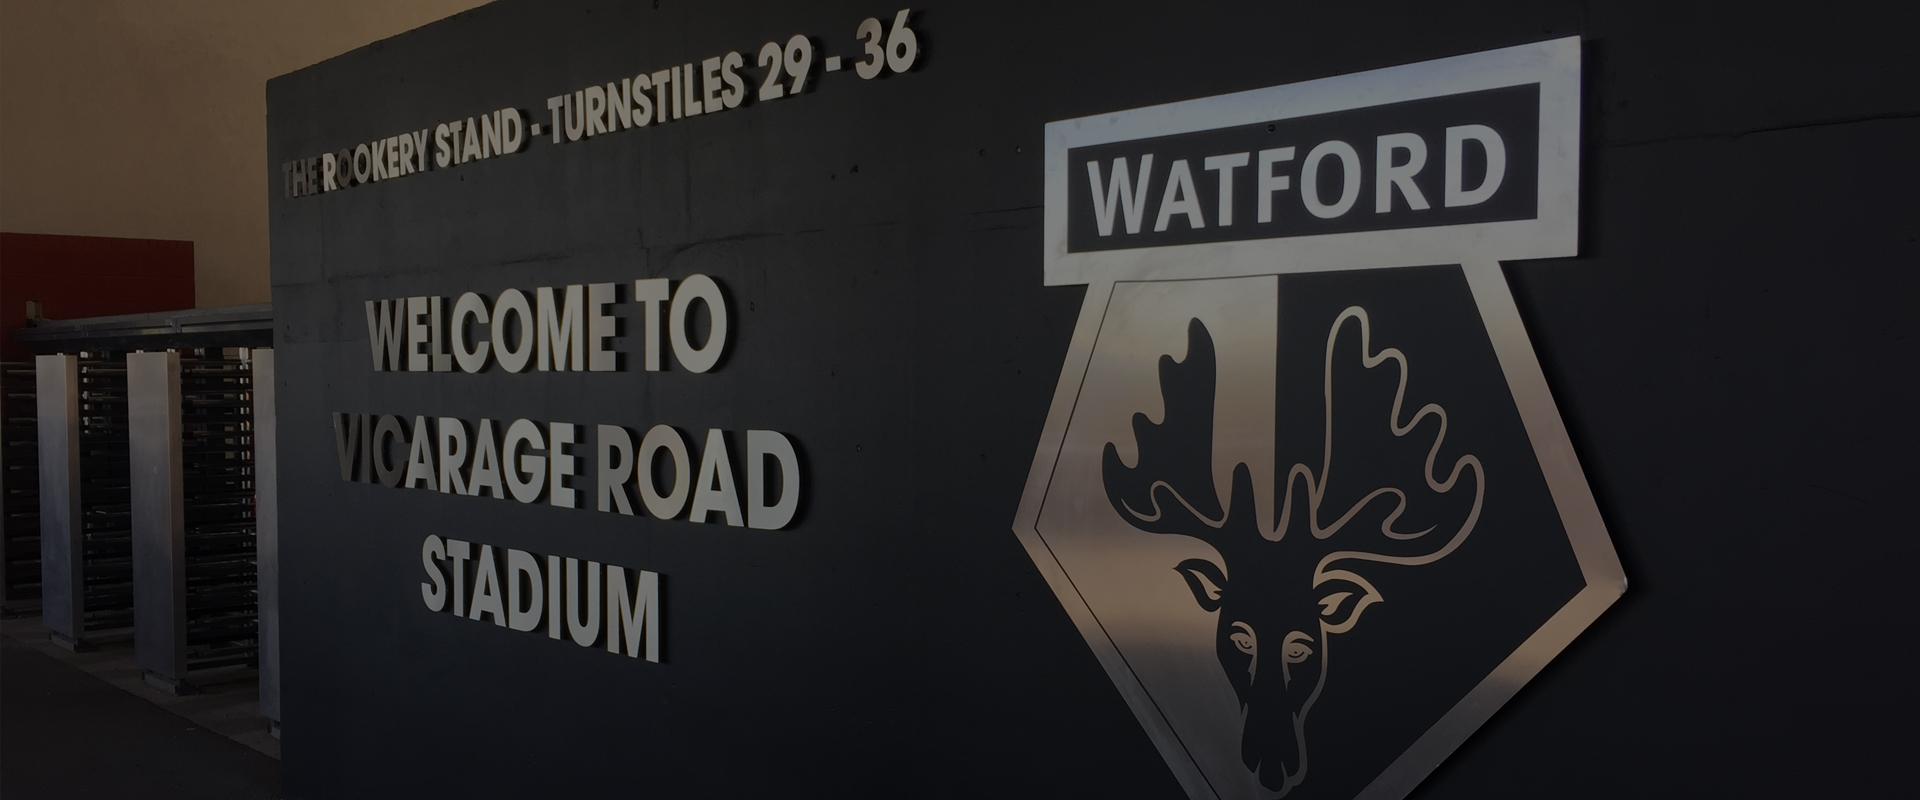 vicarage road stadium watford external signage